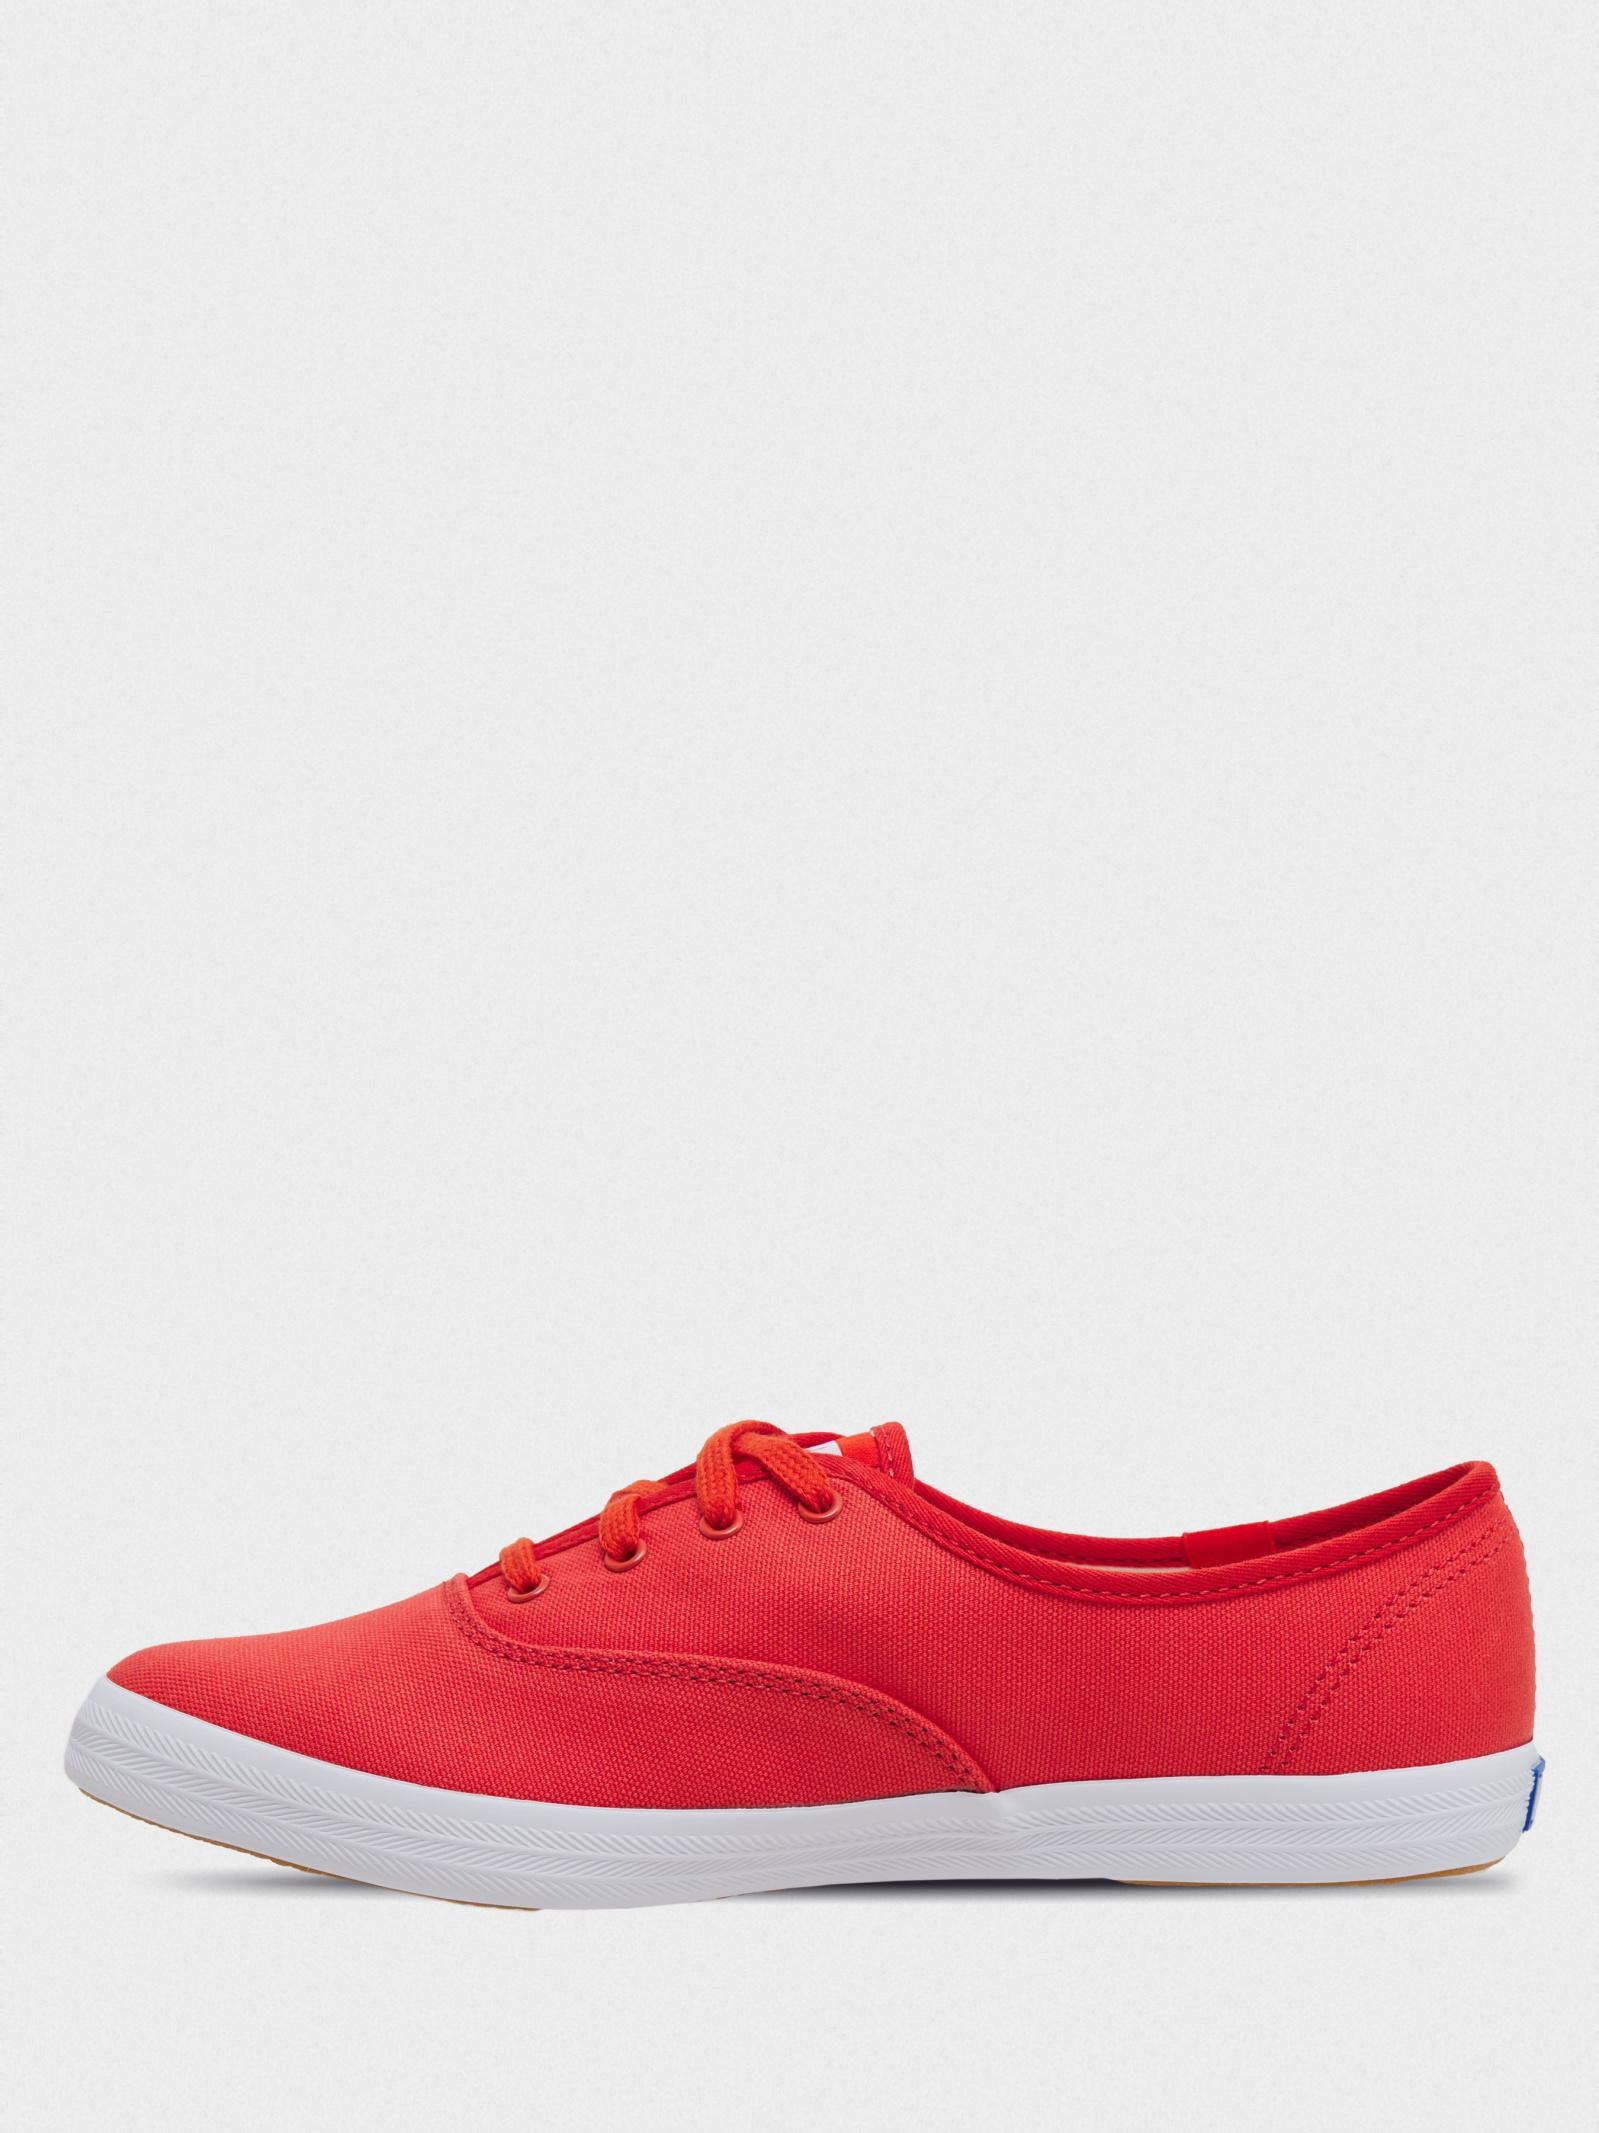 Кеды для женщин KEDS CHAMPION SEASONAL SOLIDS KD327 цена обуви, 2017